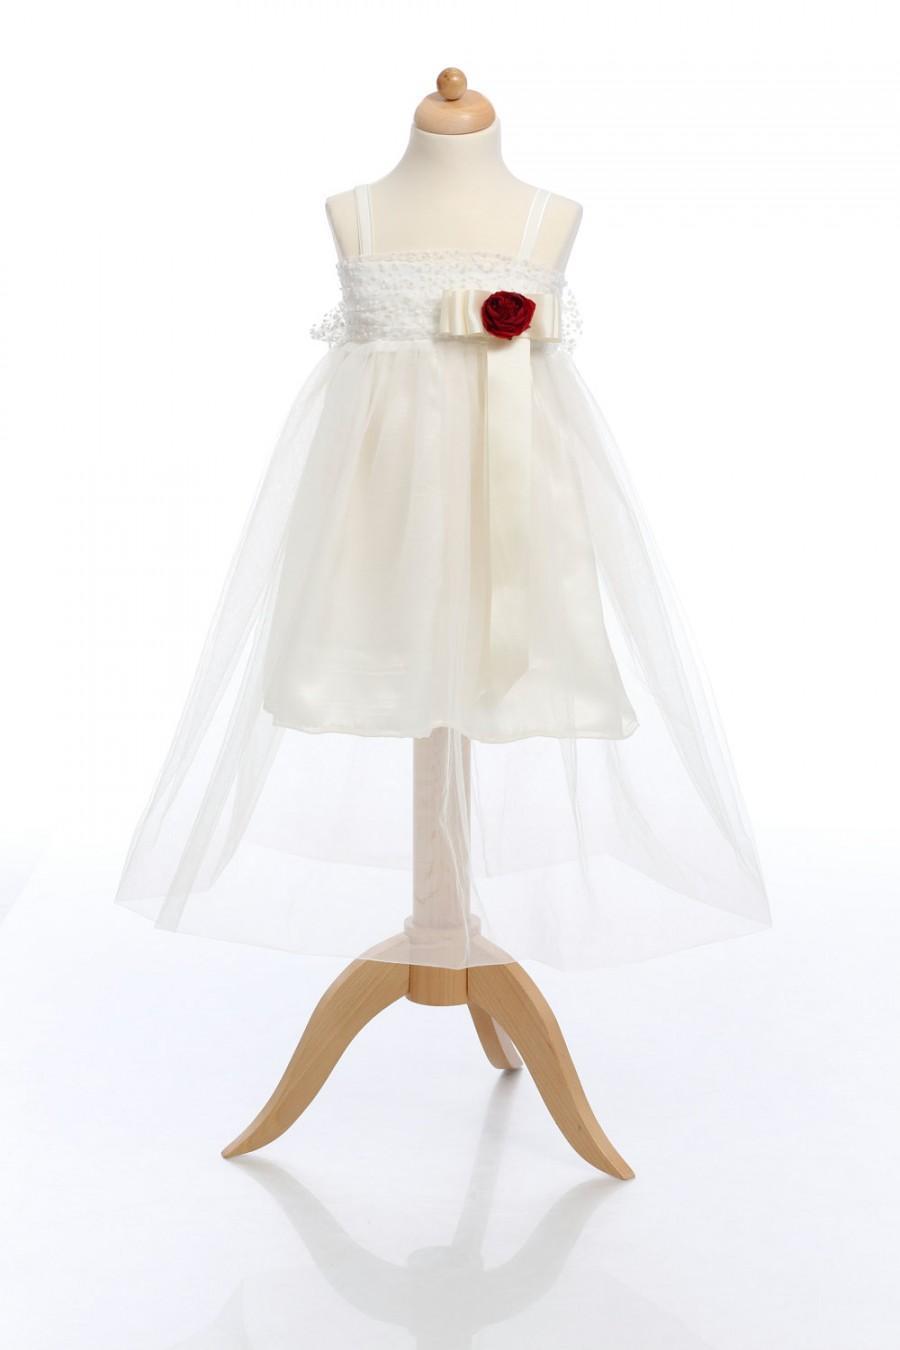 Mariage - Ivory Girl Dress, Baby Girl Dress, Ivory Tulle Dress, Toddler Dress, Fairy Tutu Dress, Christening Dress, Birthday Dress, Communion Kid